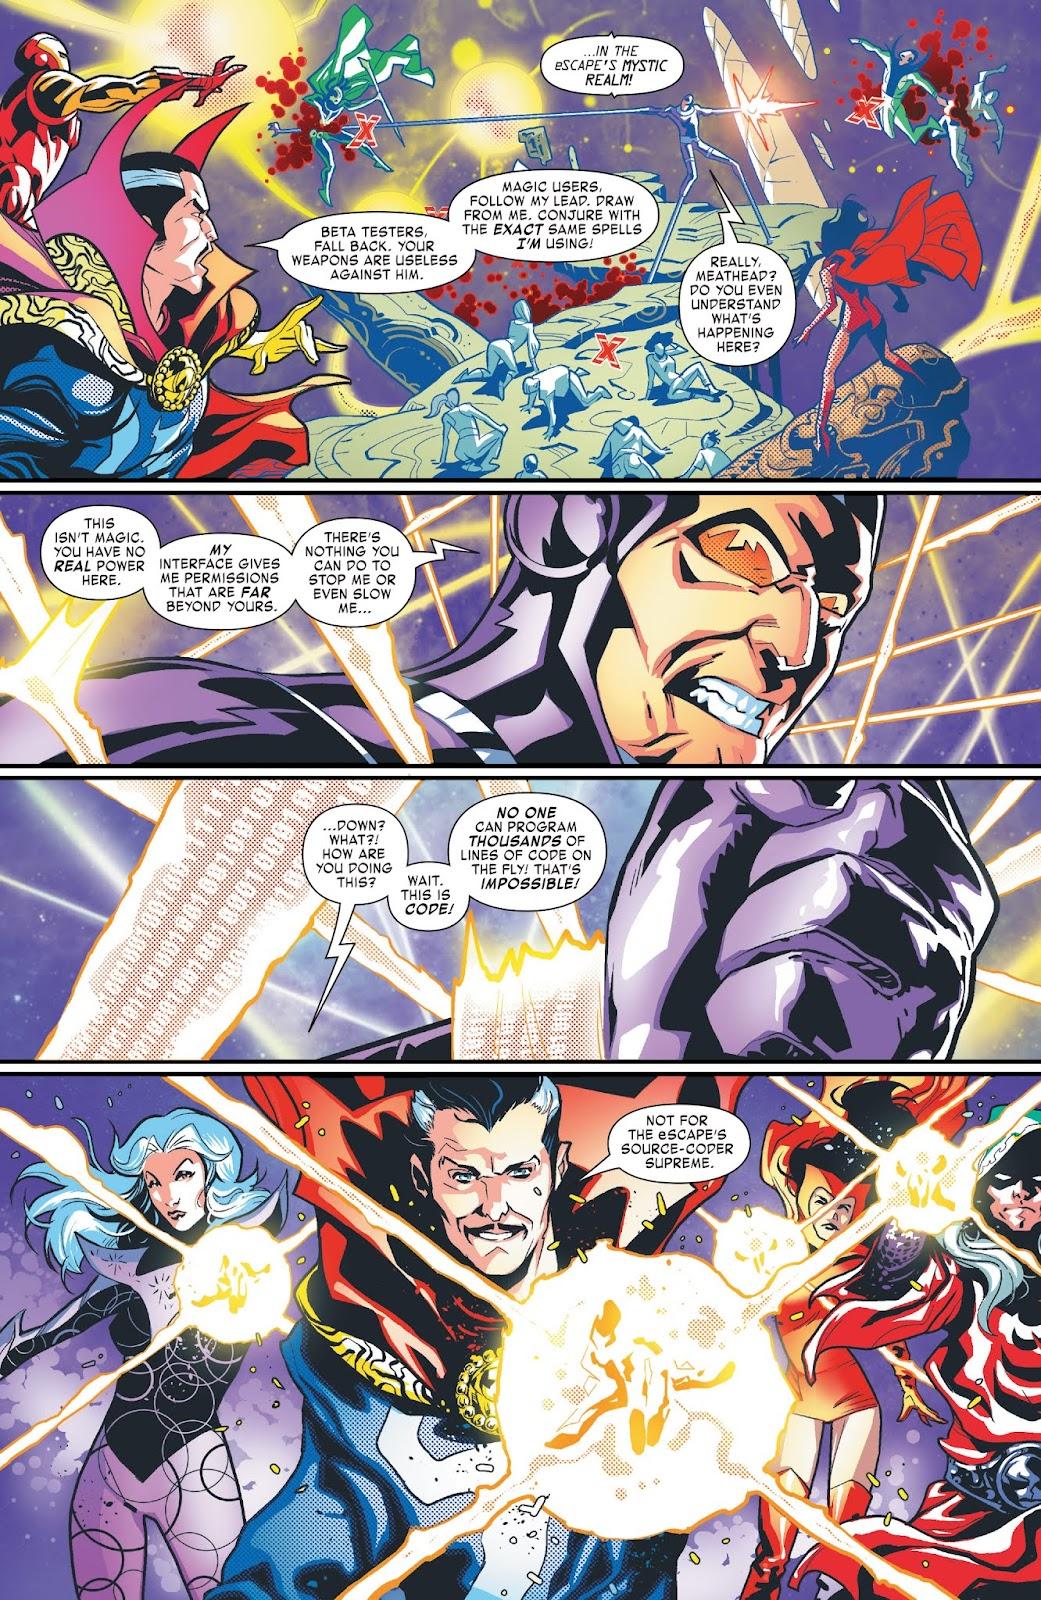 Read online Tony Stark: Iron Man comic -  Issue #3 - 16